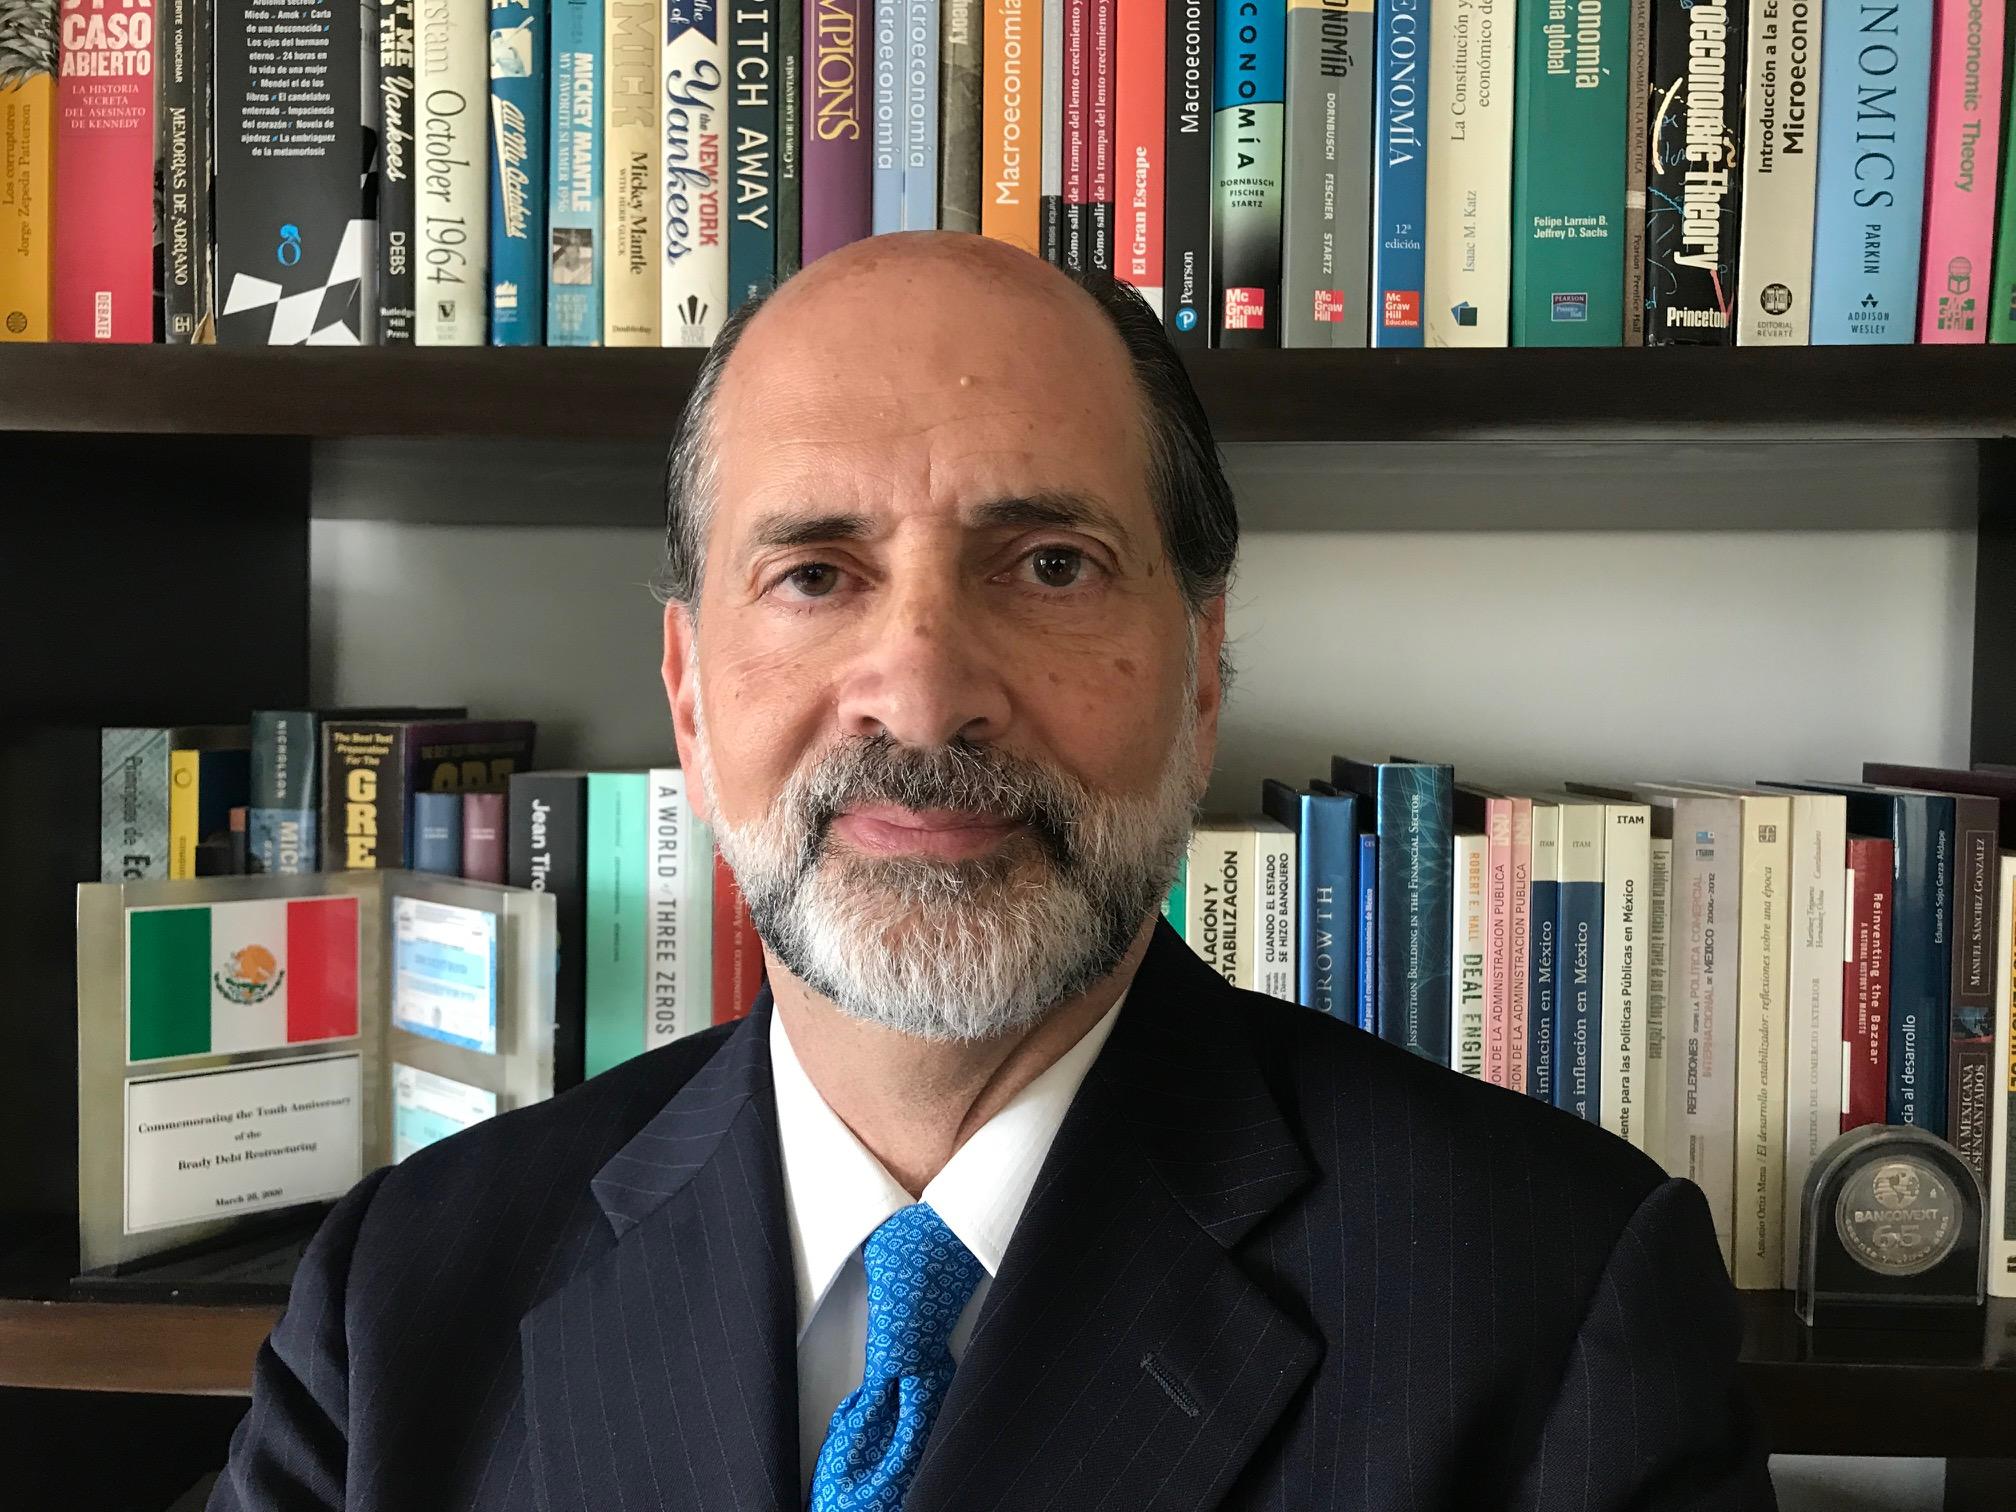 Sergio Fadl Kuri